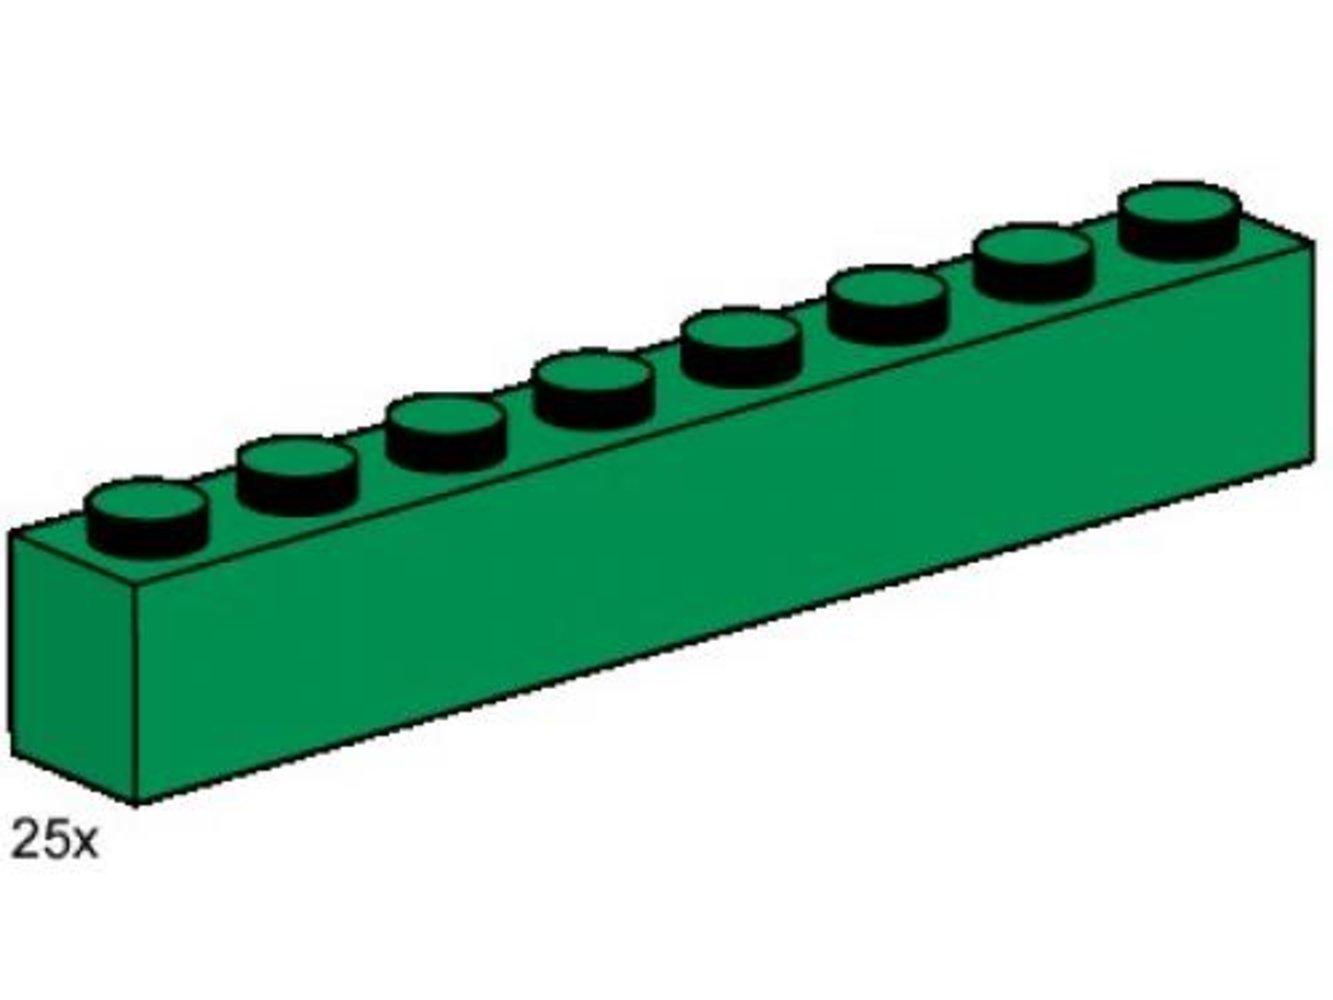 1 x 8 Dark Green Bricks